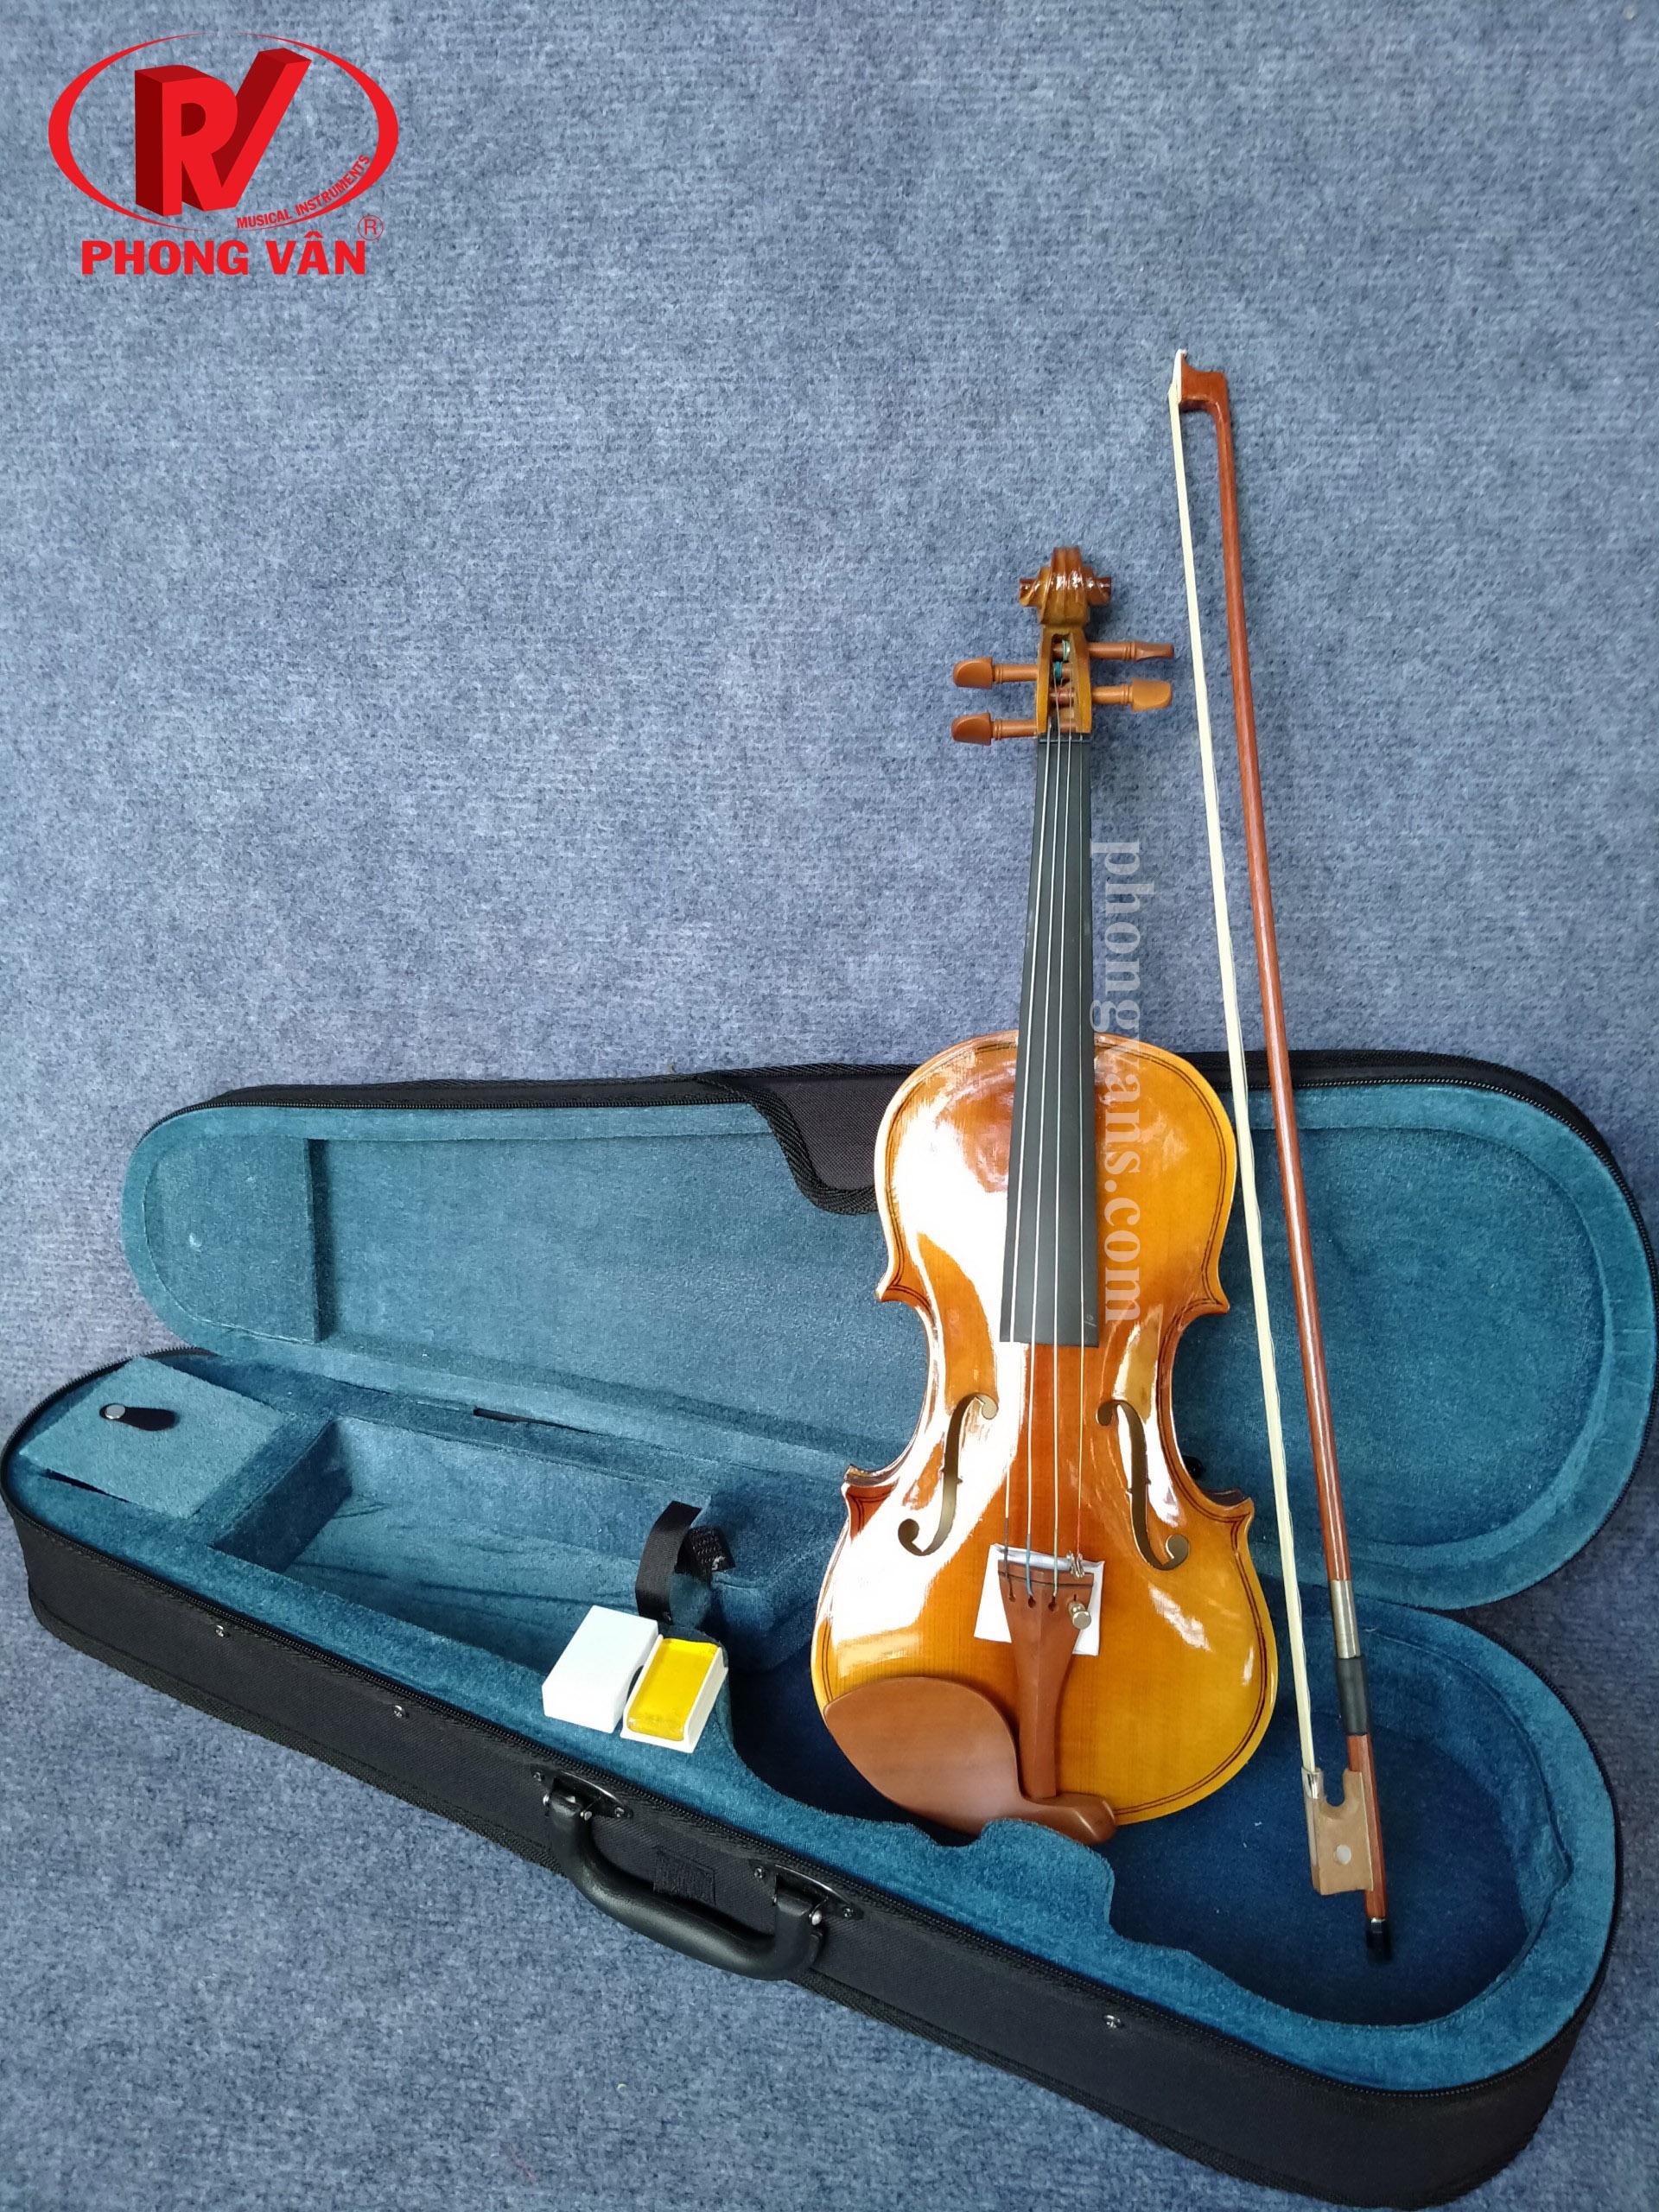 Đàn violin size 1/2 vân gỗ (Vĩ cầm)